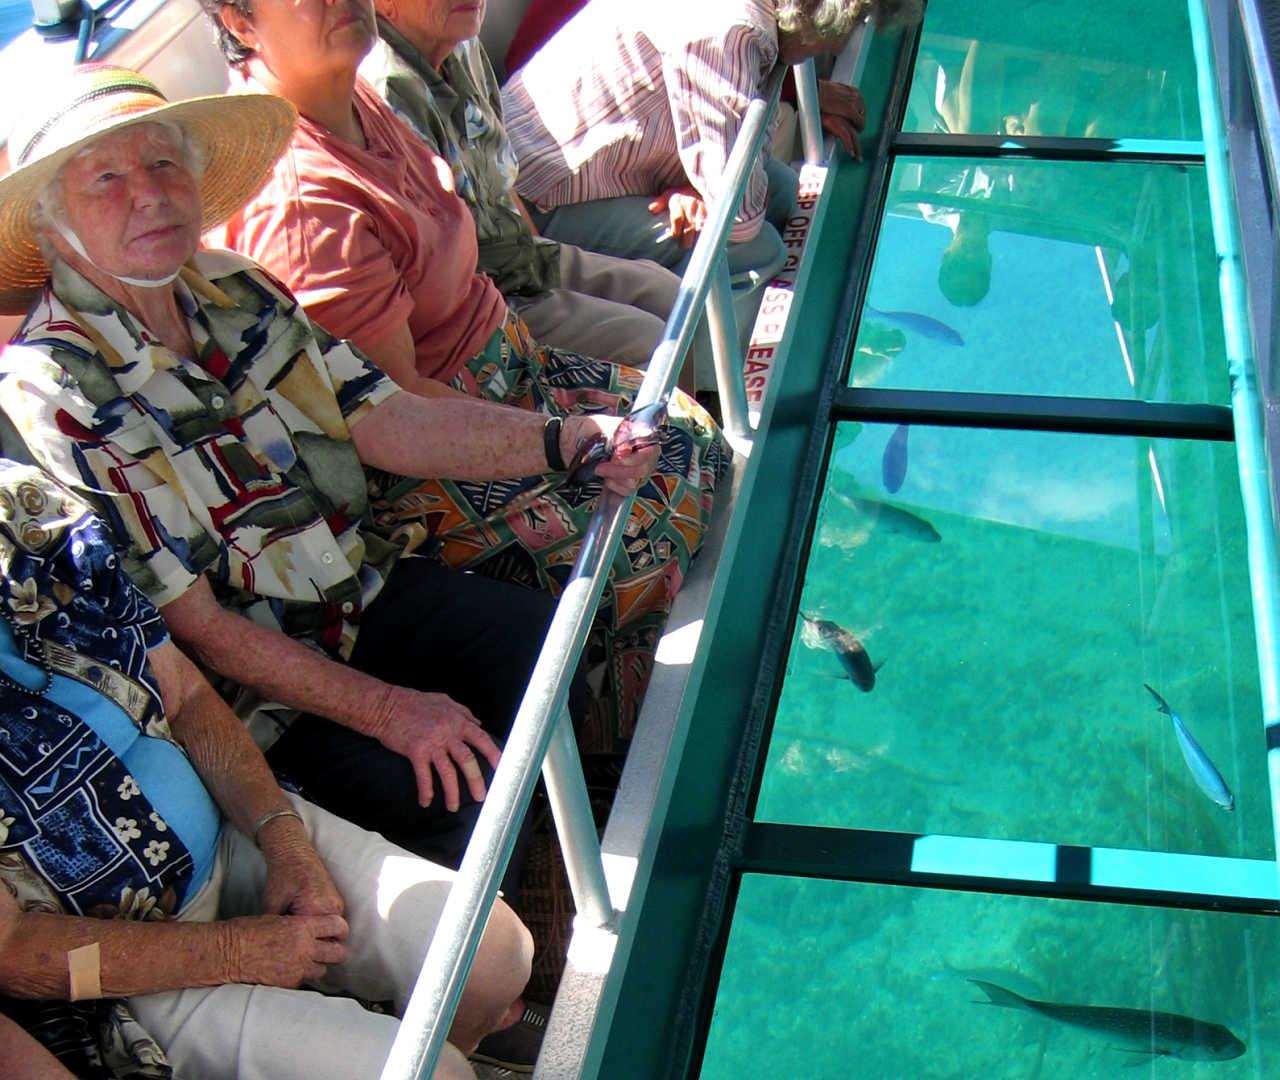 Glass Bottom boat excursion, Auckland, New Zealand @Aucklandnz